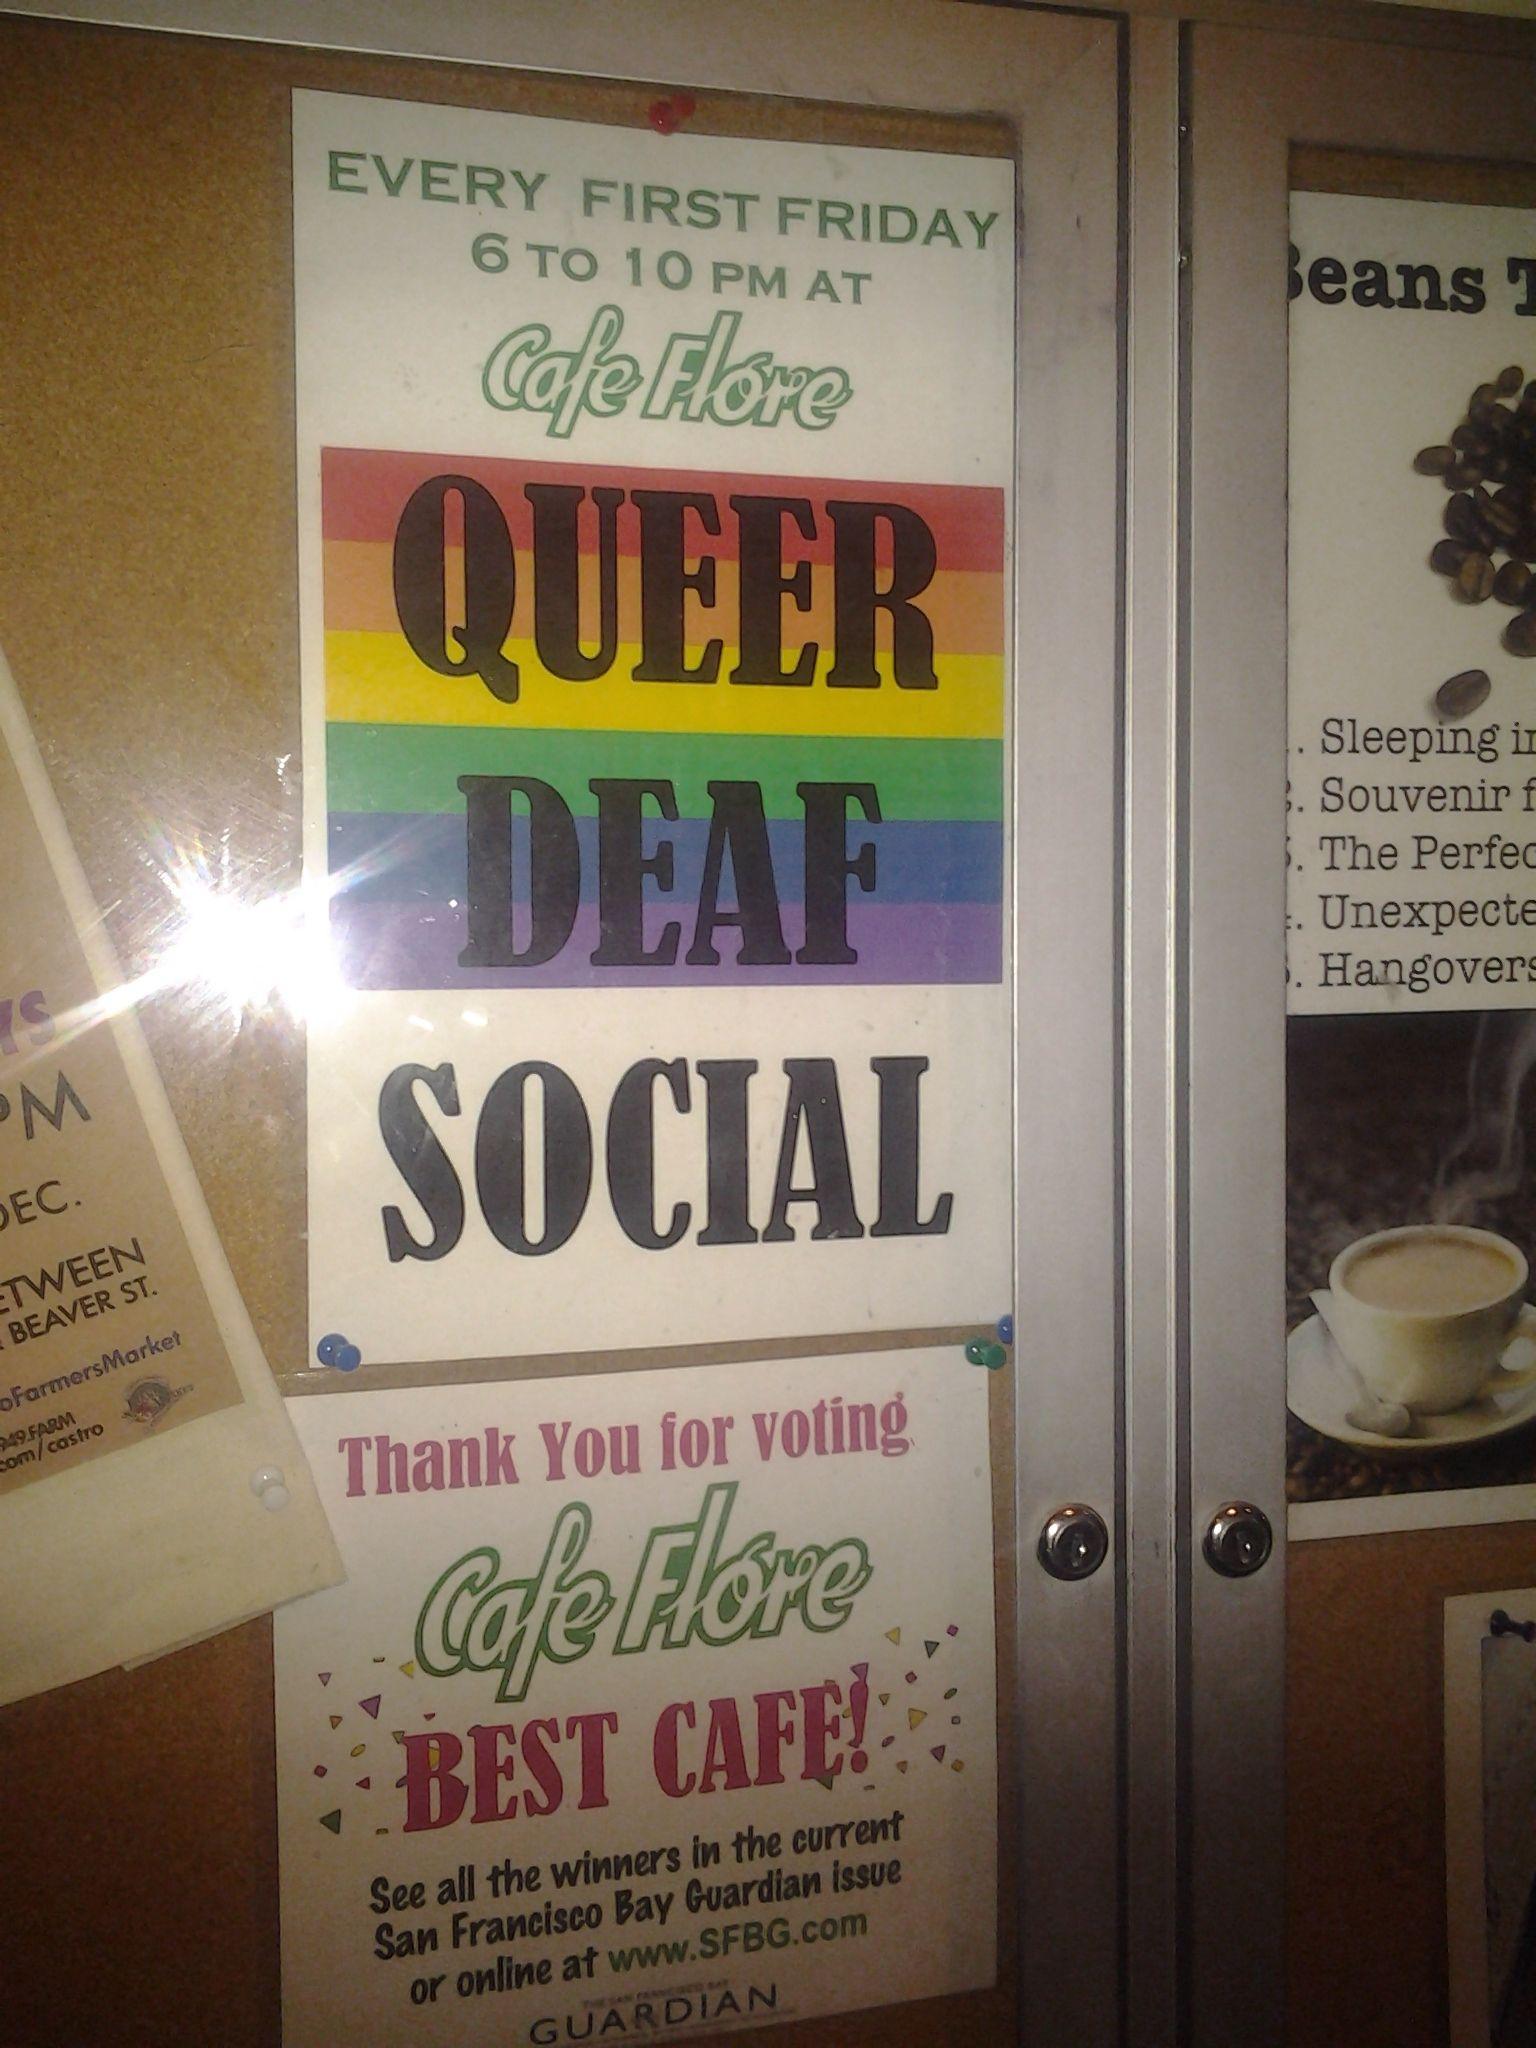 Deaf Social: SF LGBT Deaf Monthly Social-1st Fridays - SF LGBT Deaf ...: meetup.com/lgbt-deaf-hoh-and-asl-allies/events/226452179